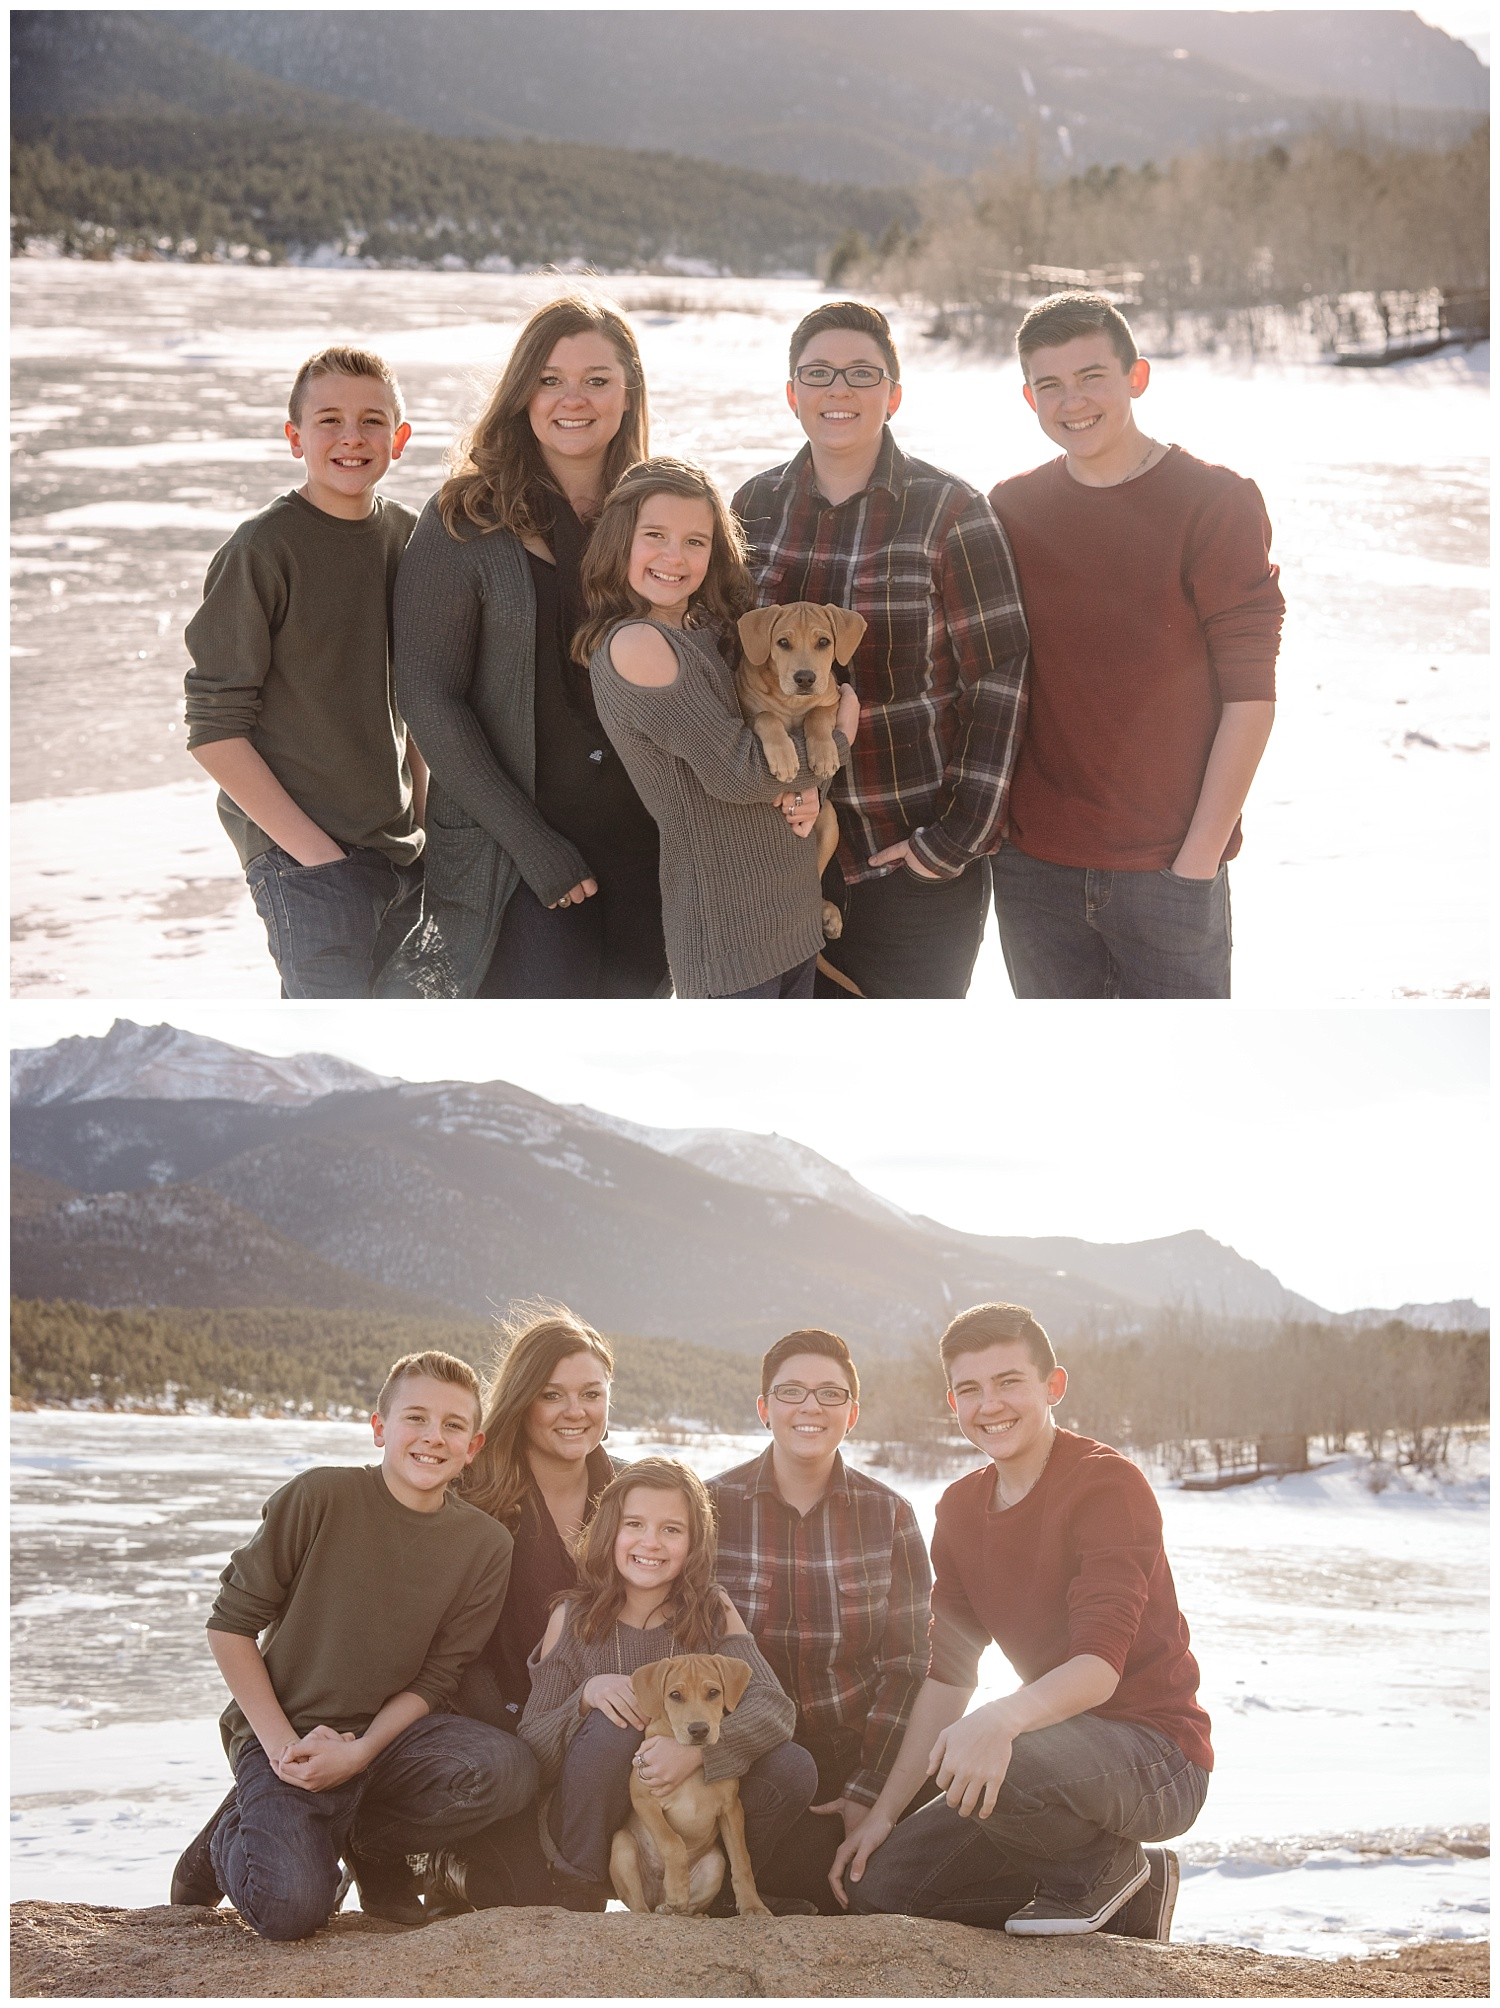 Young Family Posing 2 Moms   Jenny and Tara's Epic Mountain Engagement Session   Pikes Peak, Colorado Photography   Farm Wedding Photographer   Apollo Fields Wedding Photojournalism